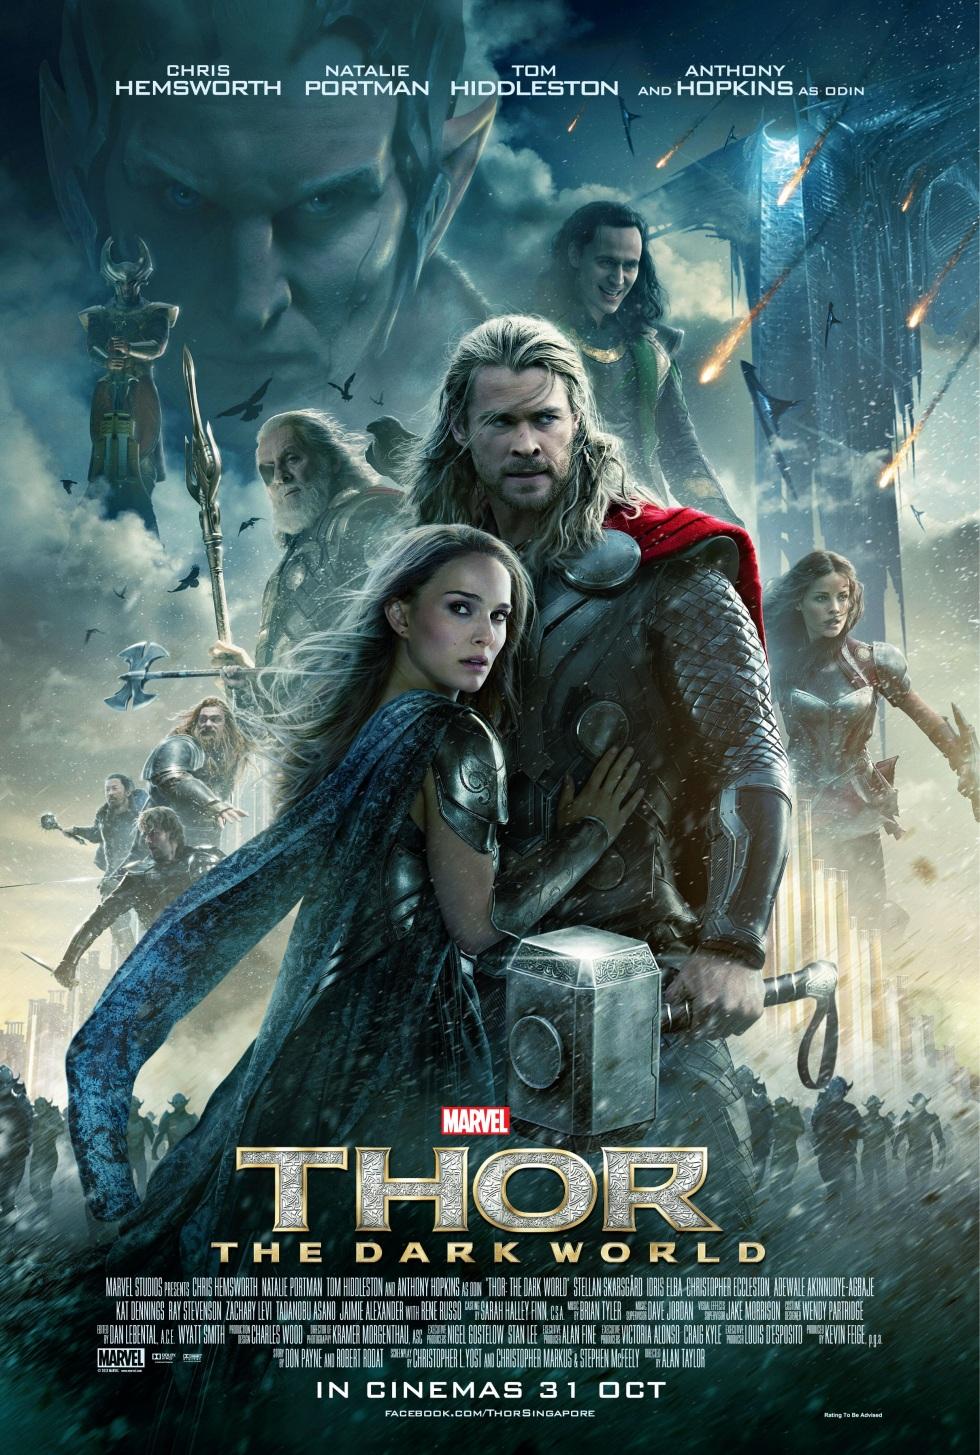 Thor 1 pic